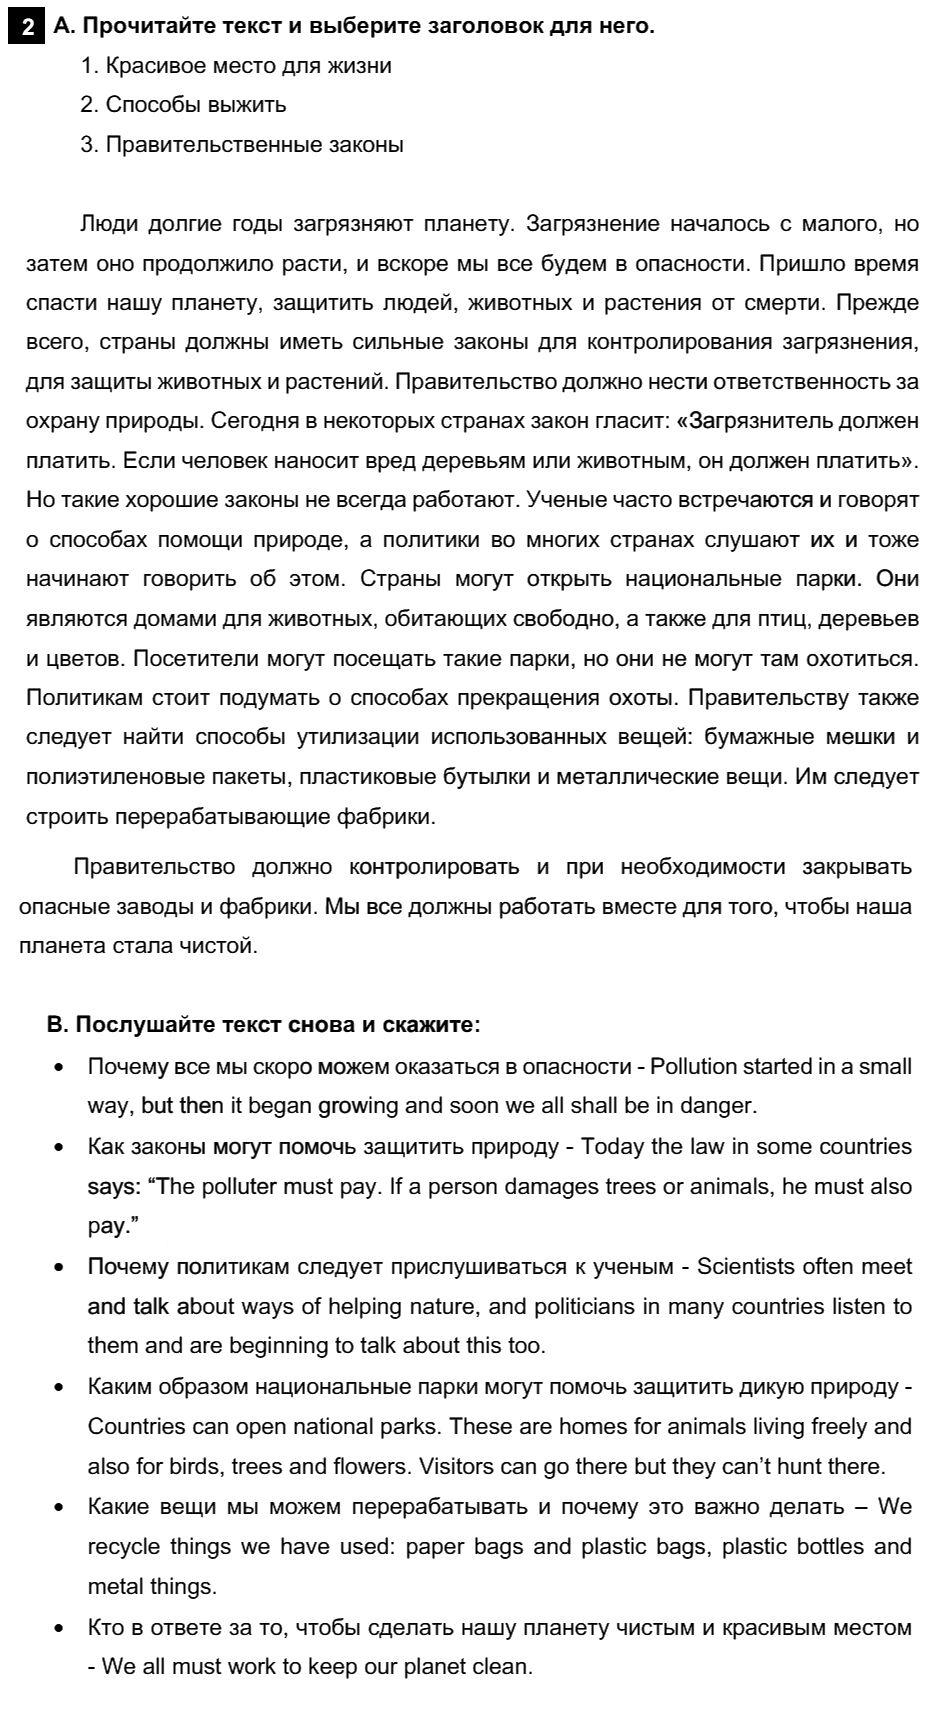 Английский язык 7 класс Афанасьева О. В. Unit 5. Экология / Шаг 9: 2